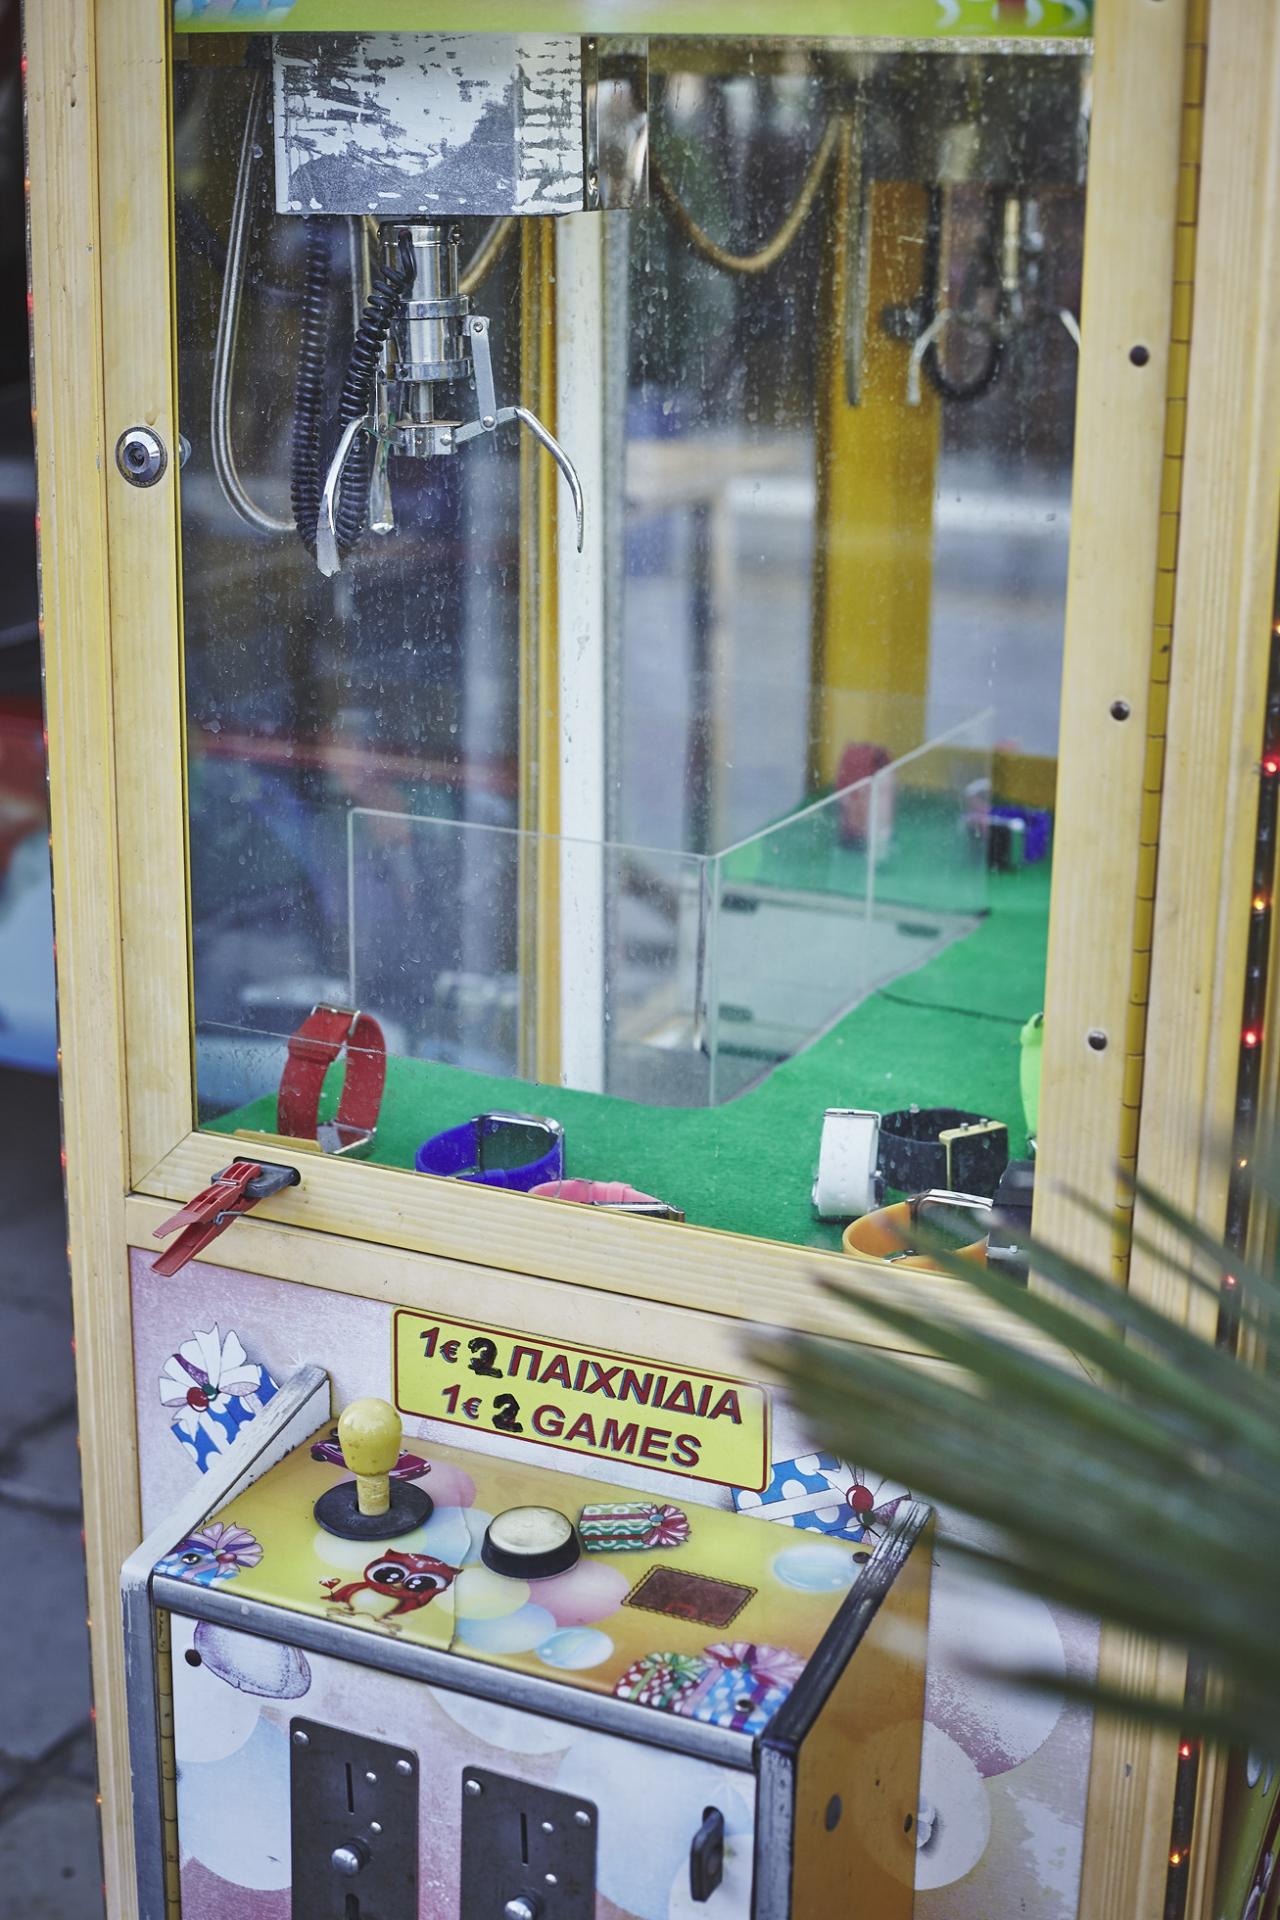 lukasgaechter.com souvenir